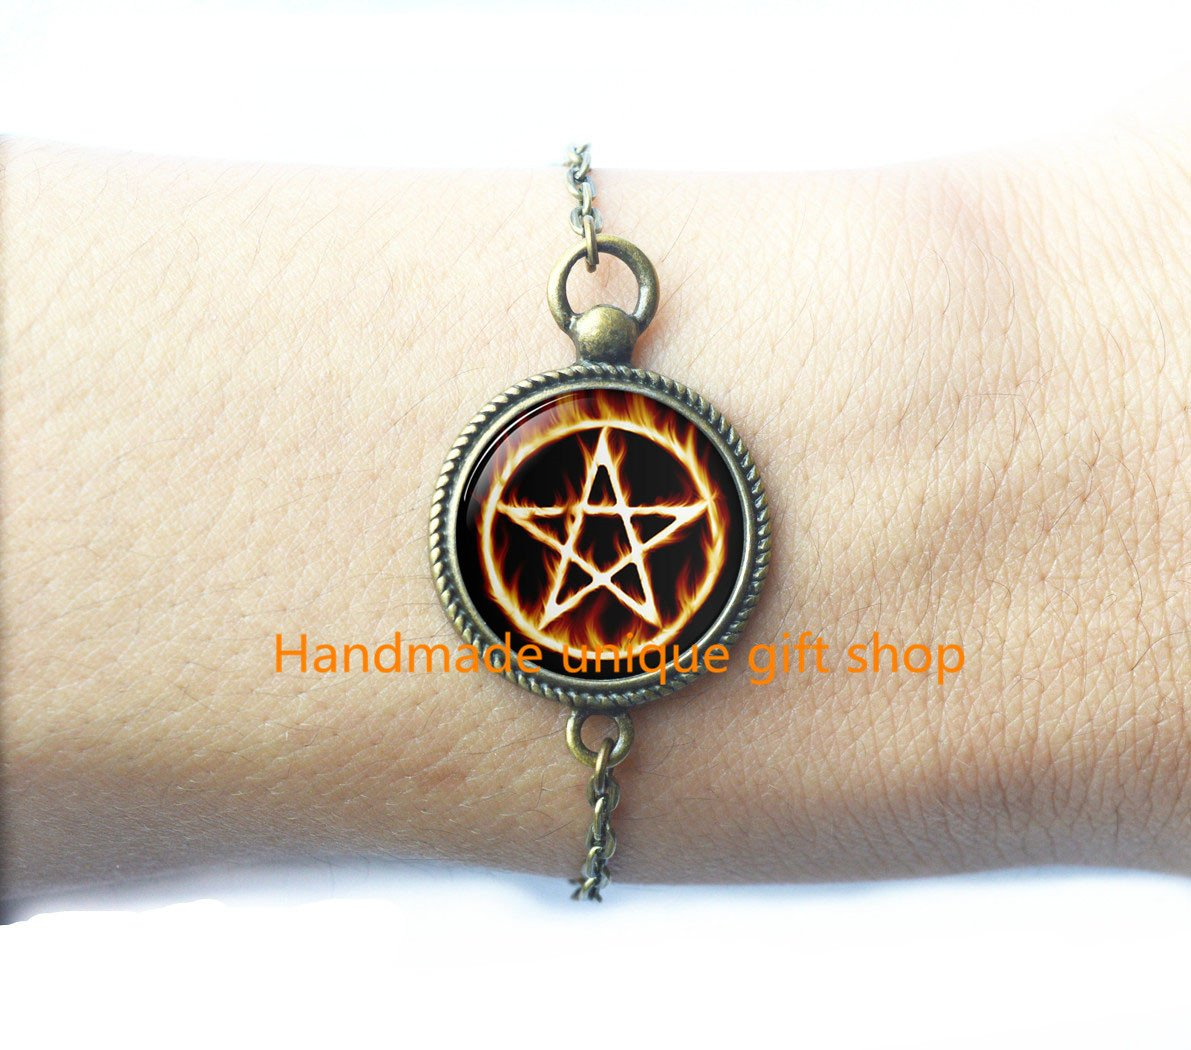 Wiccan Jewelry Astrology Bracelets-RC353 Pentagram Jewelry Pentagram Bracelet Dainty Bracelet,Pentagram Bracelets Wiccan Bracelet Charm Bracelet Wiccan Bracelets Fashion Bracelet